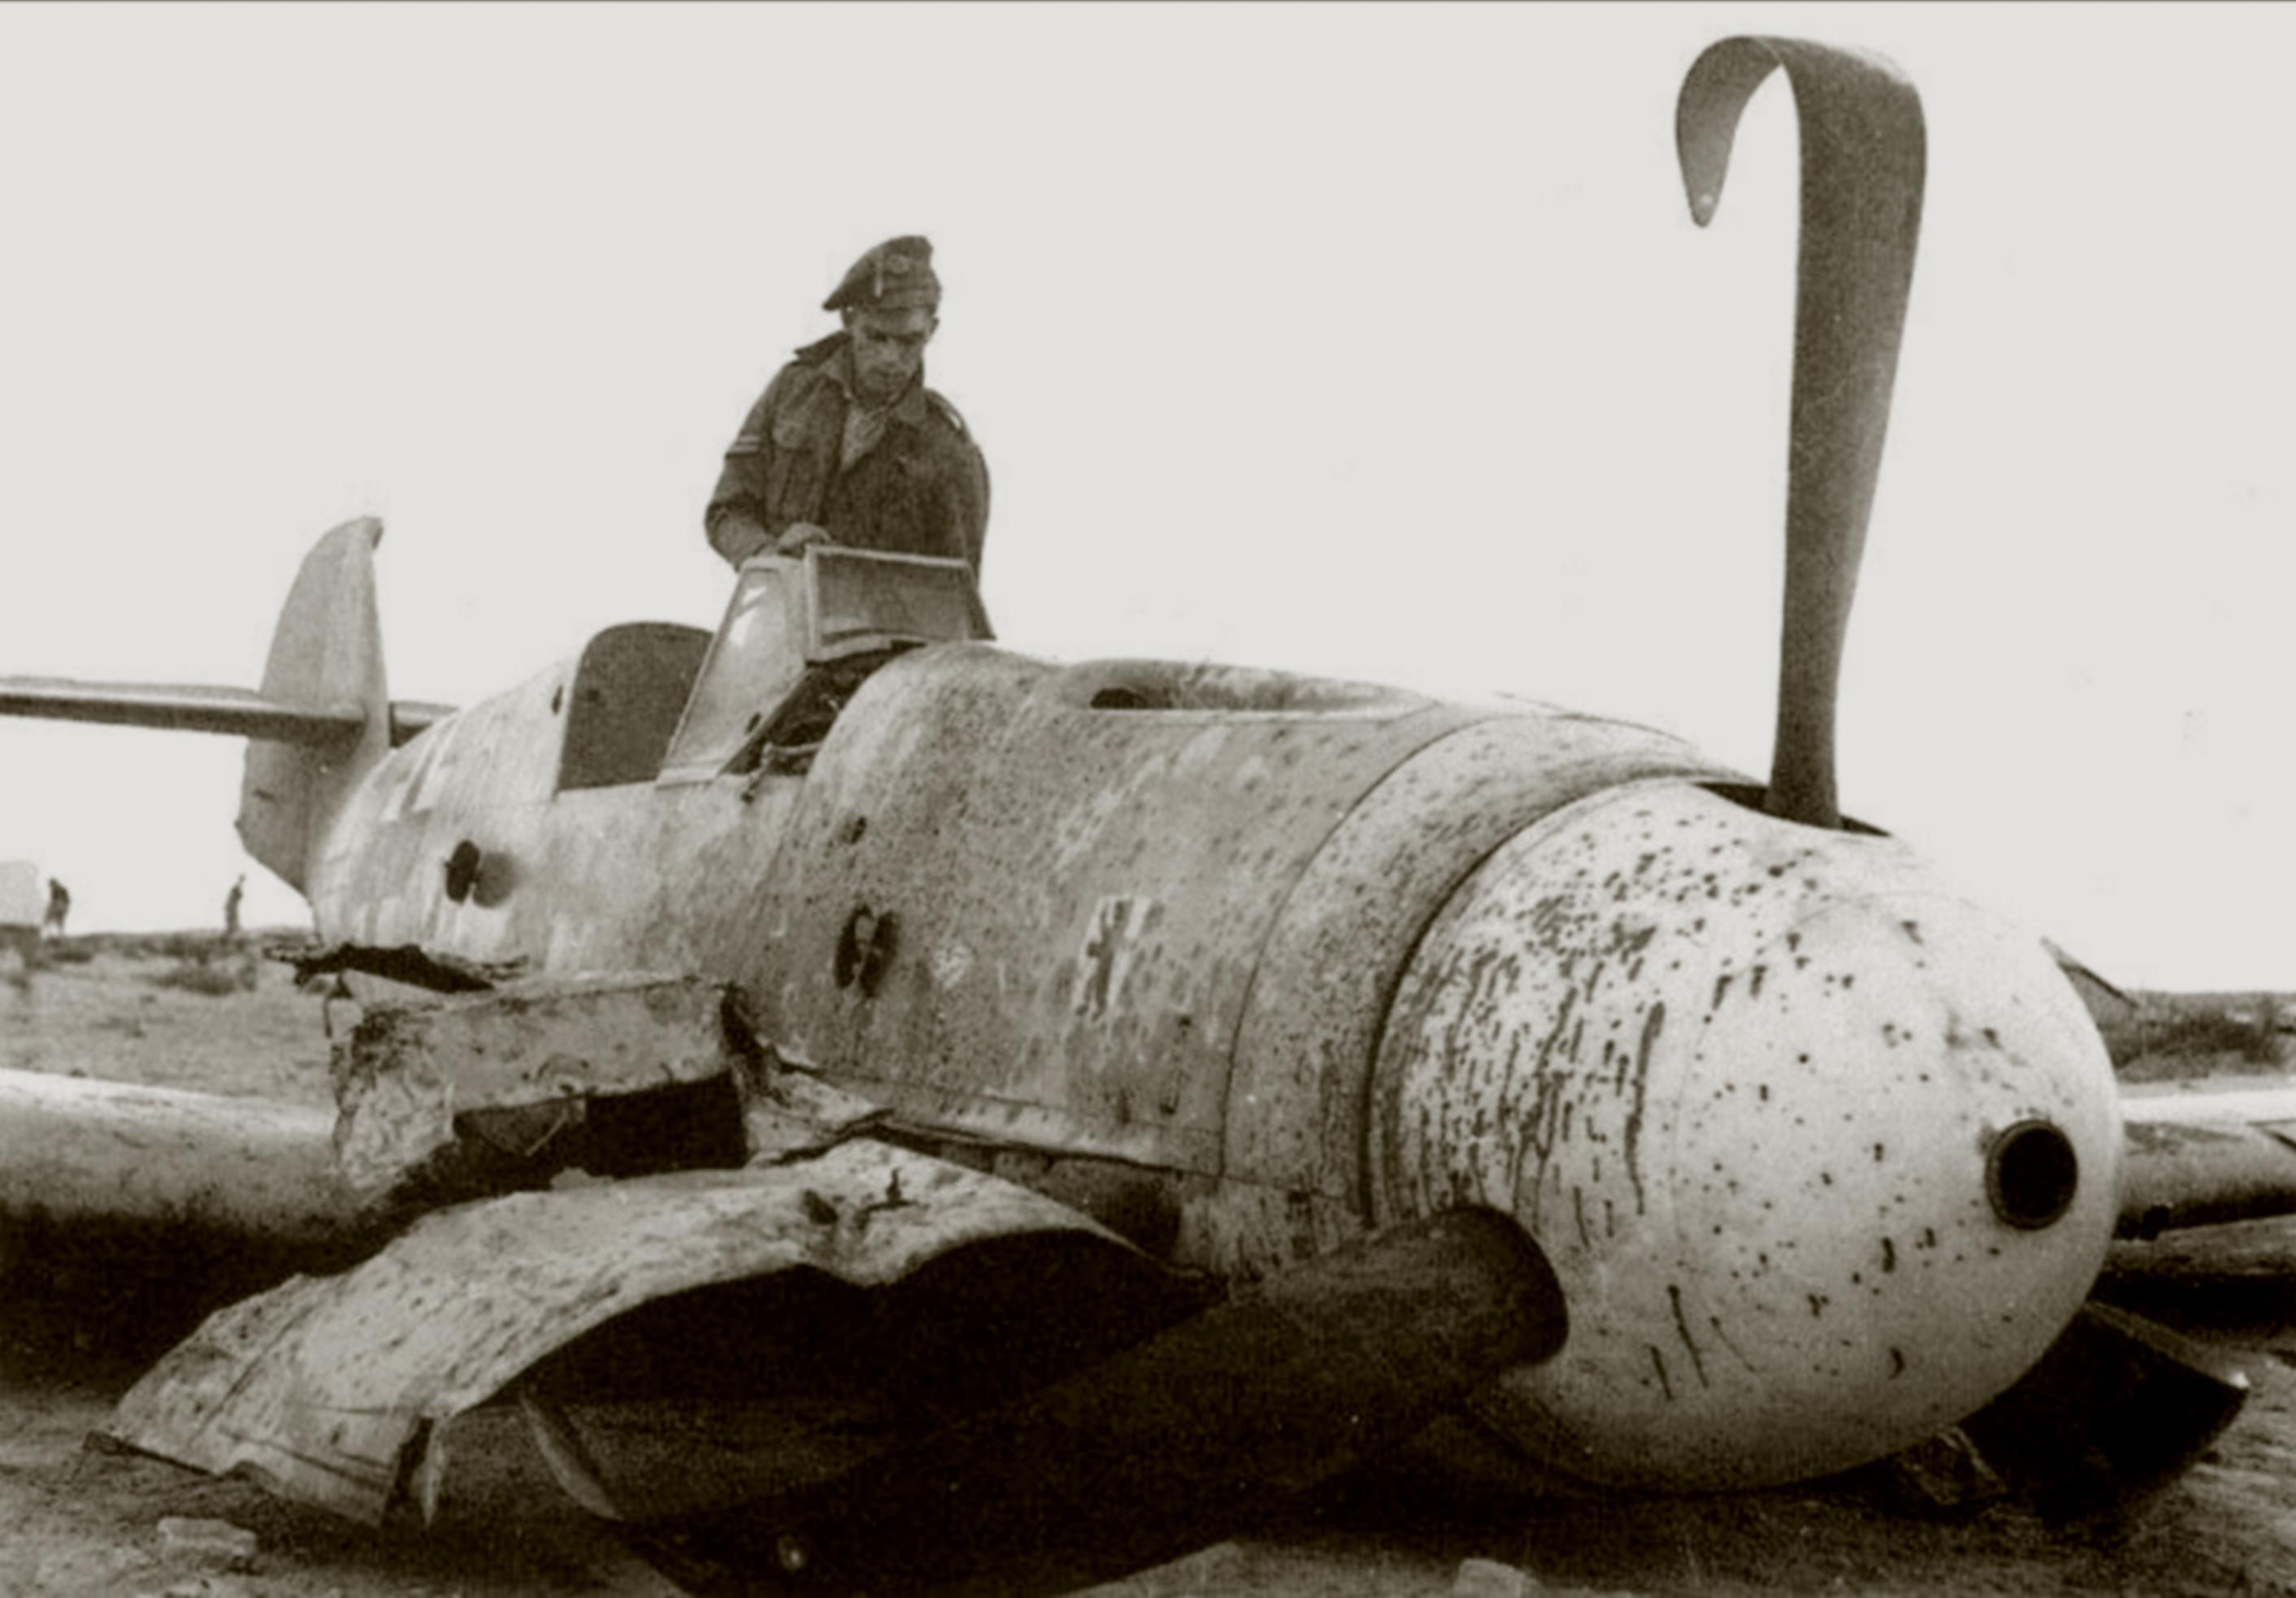 Messerschmitt Bf 109F4Trop 6.JG27 Yellow 8 crash landed Daba Egypt 1942 01